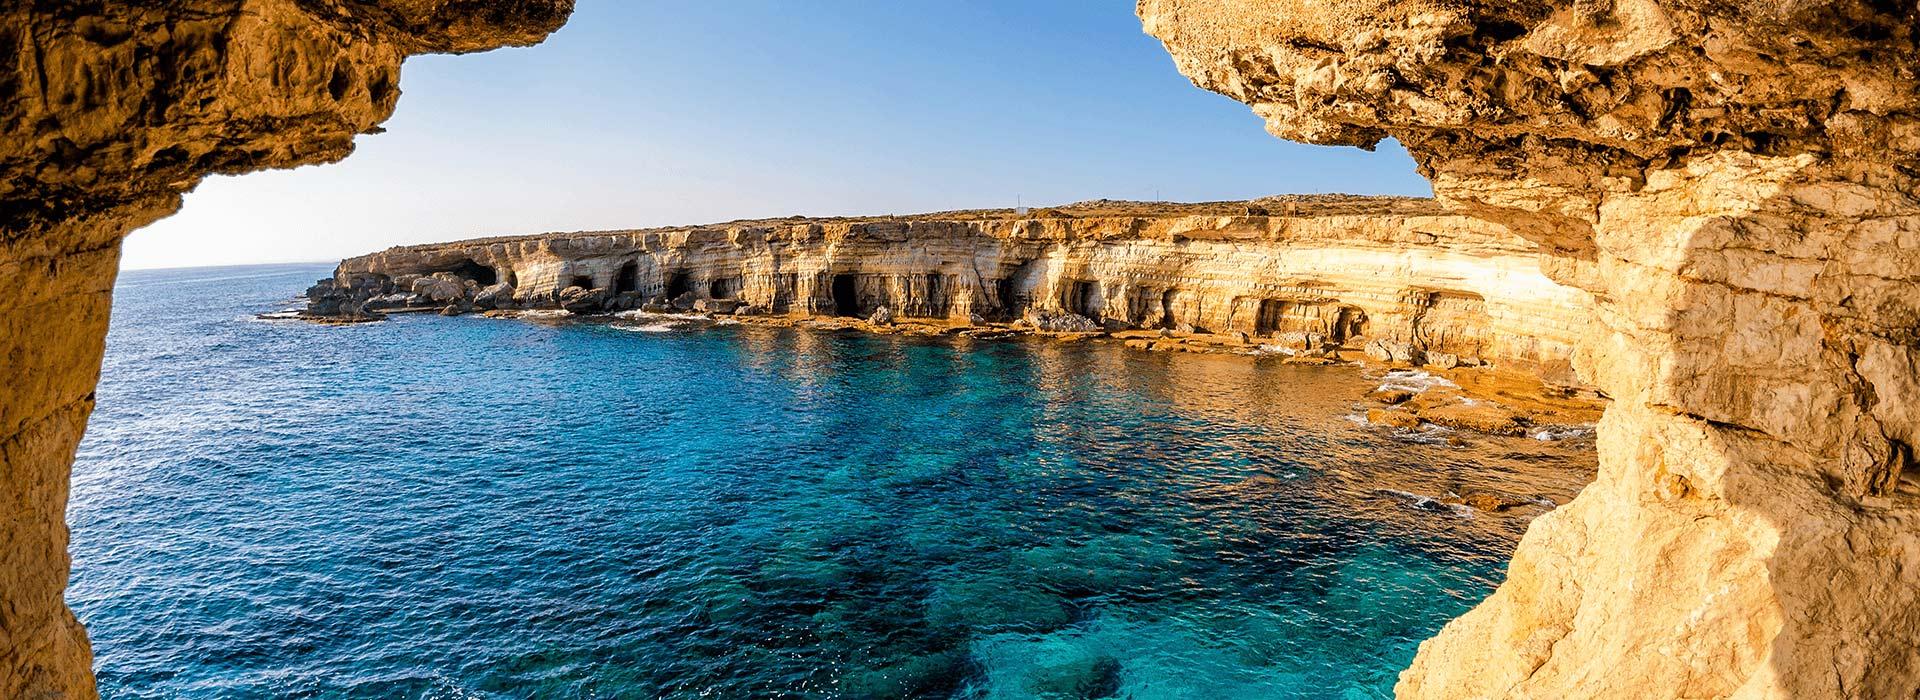 Cyprus Freediving Trip